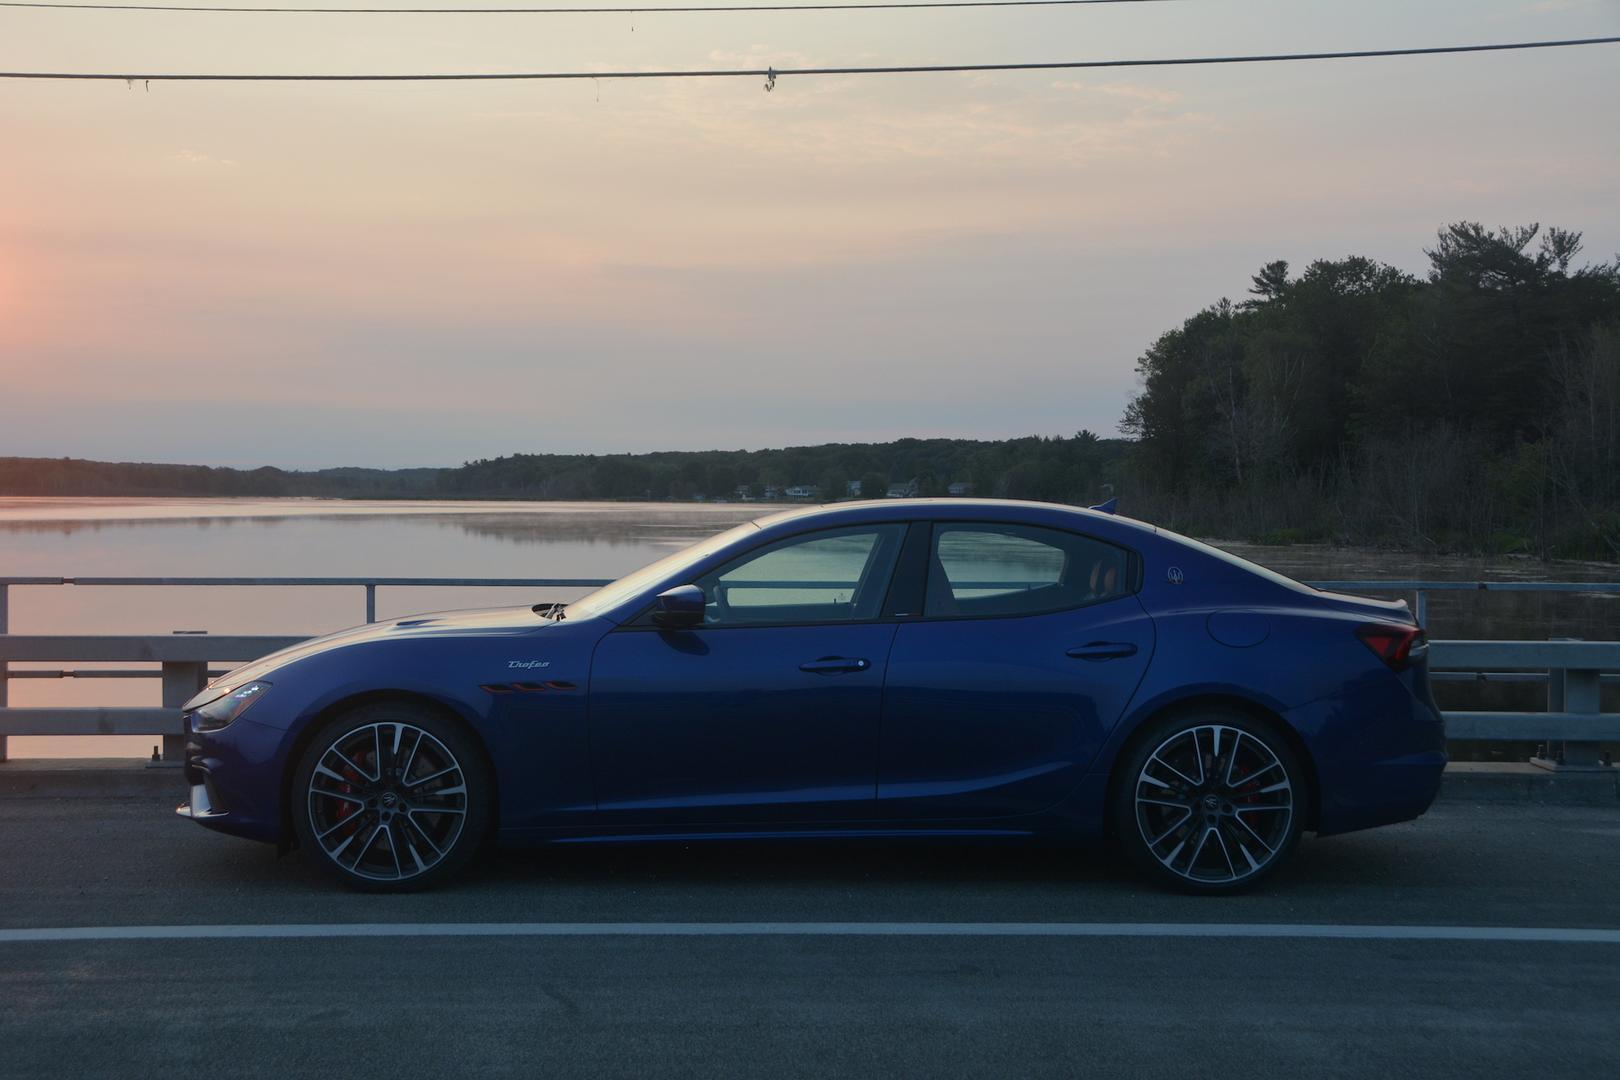 Maserati Ghibli Trofeo sunset